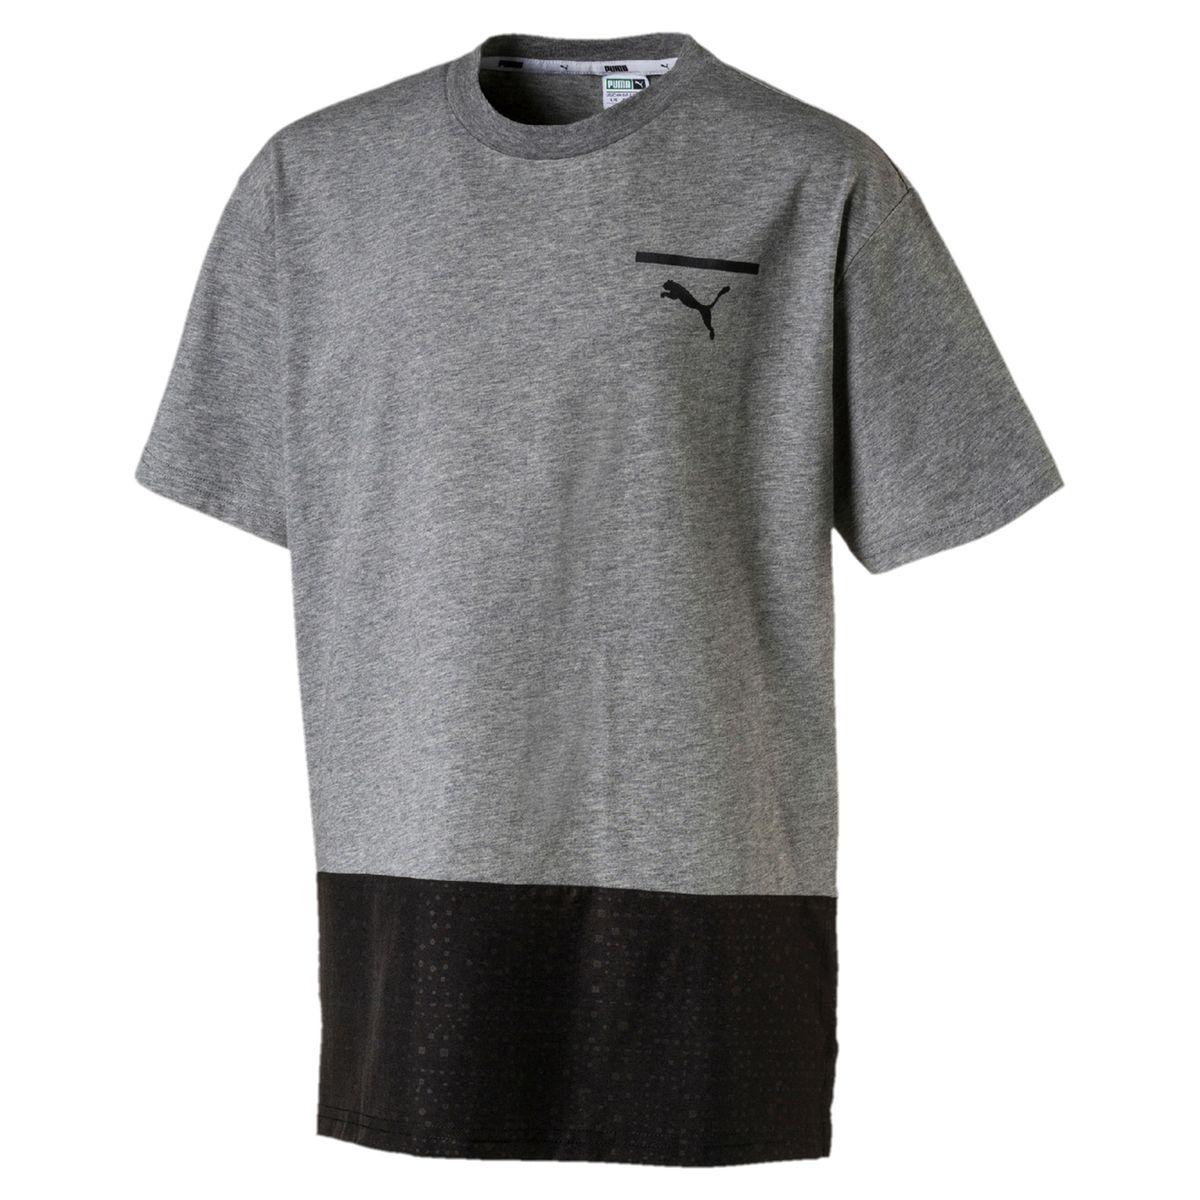 Tee-shirt 8 - 14 ans